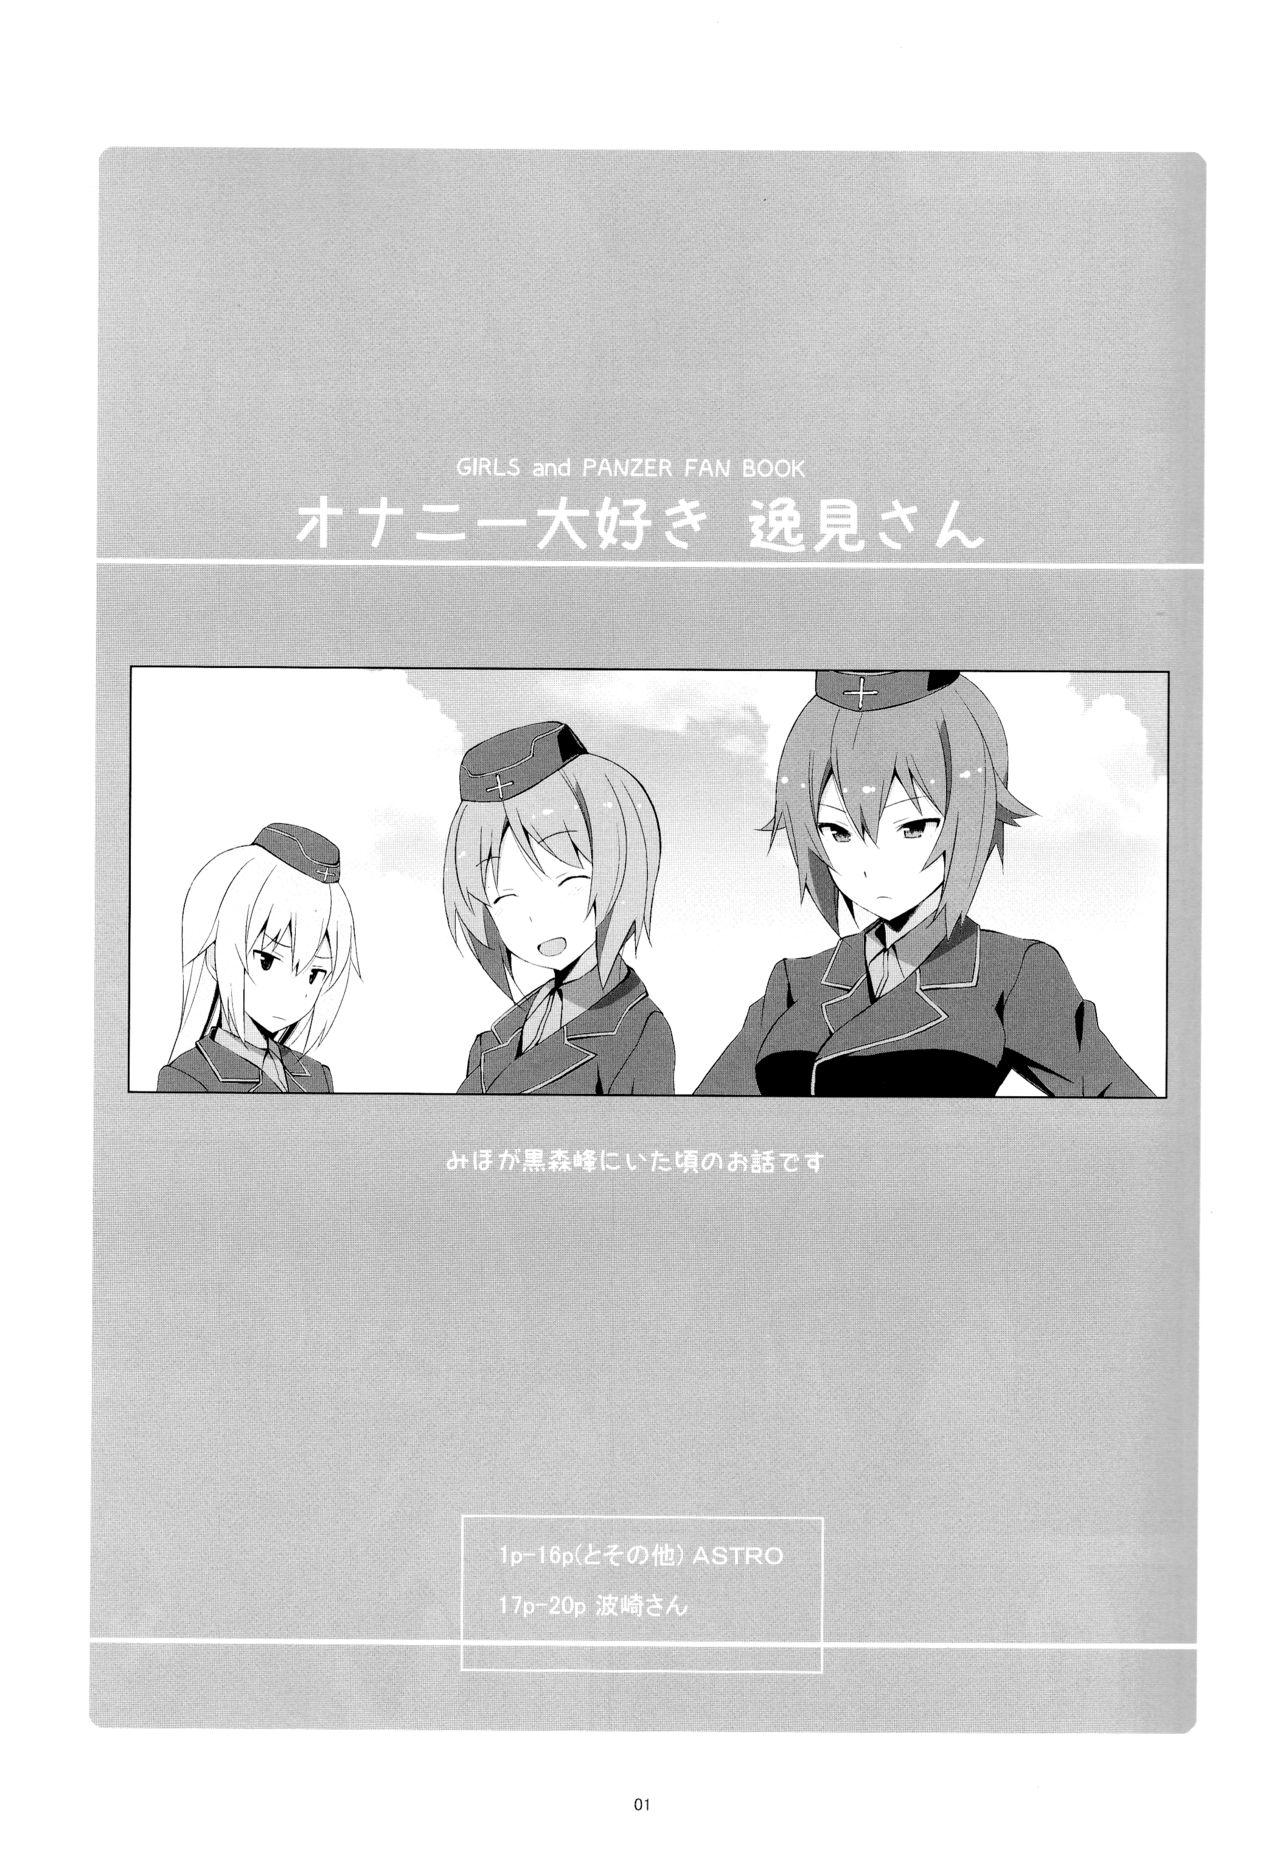 [Mushimusume Aikoukai (ASTROGUY2)] Onanie Daisuki Itsumi-san | Itsumi-san Loves To Masturbate (Girls und Panzer) [English] [Doujins.com] [2016-03-31] 1